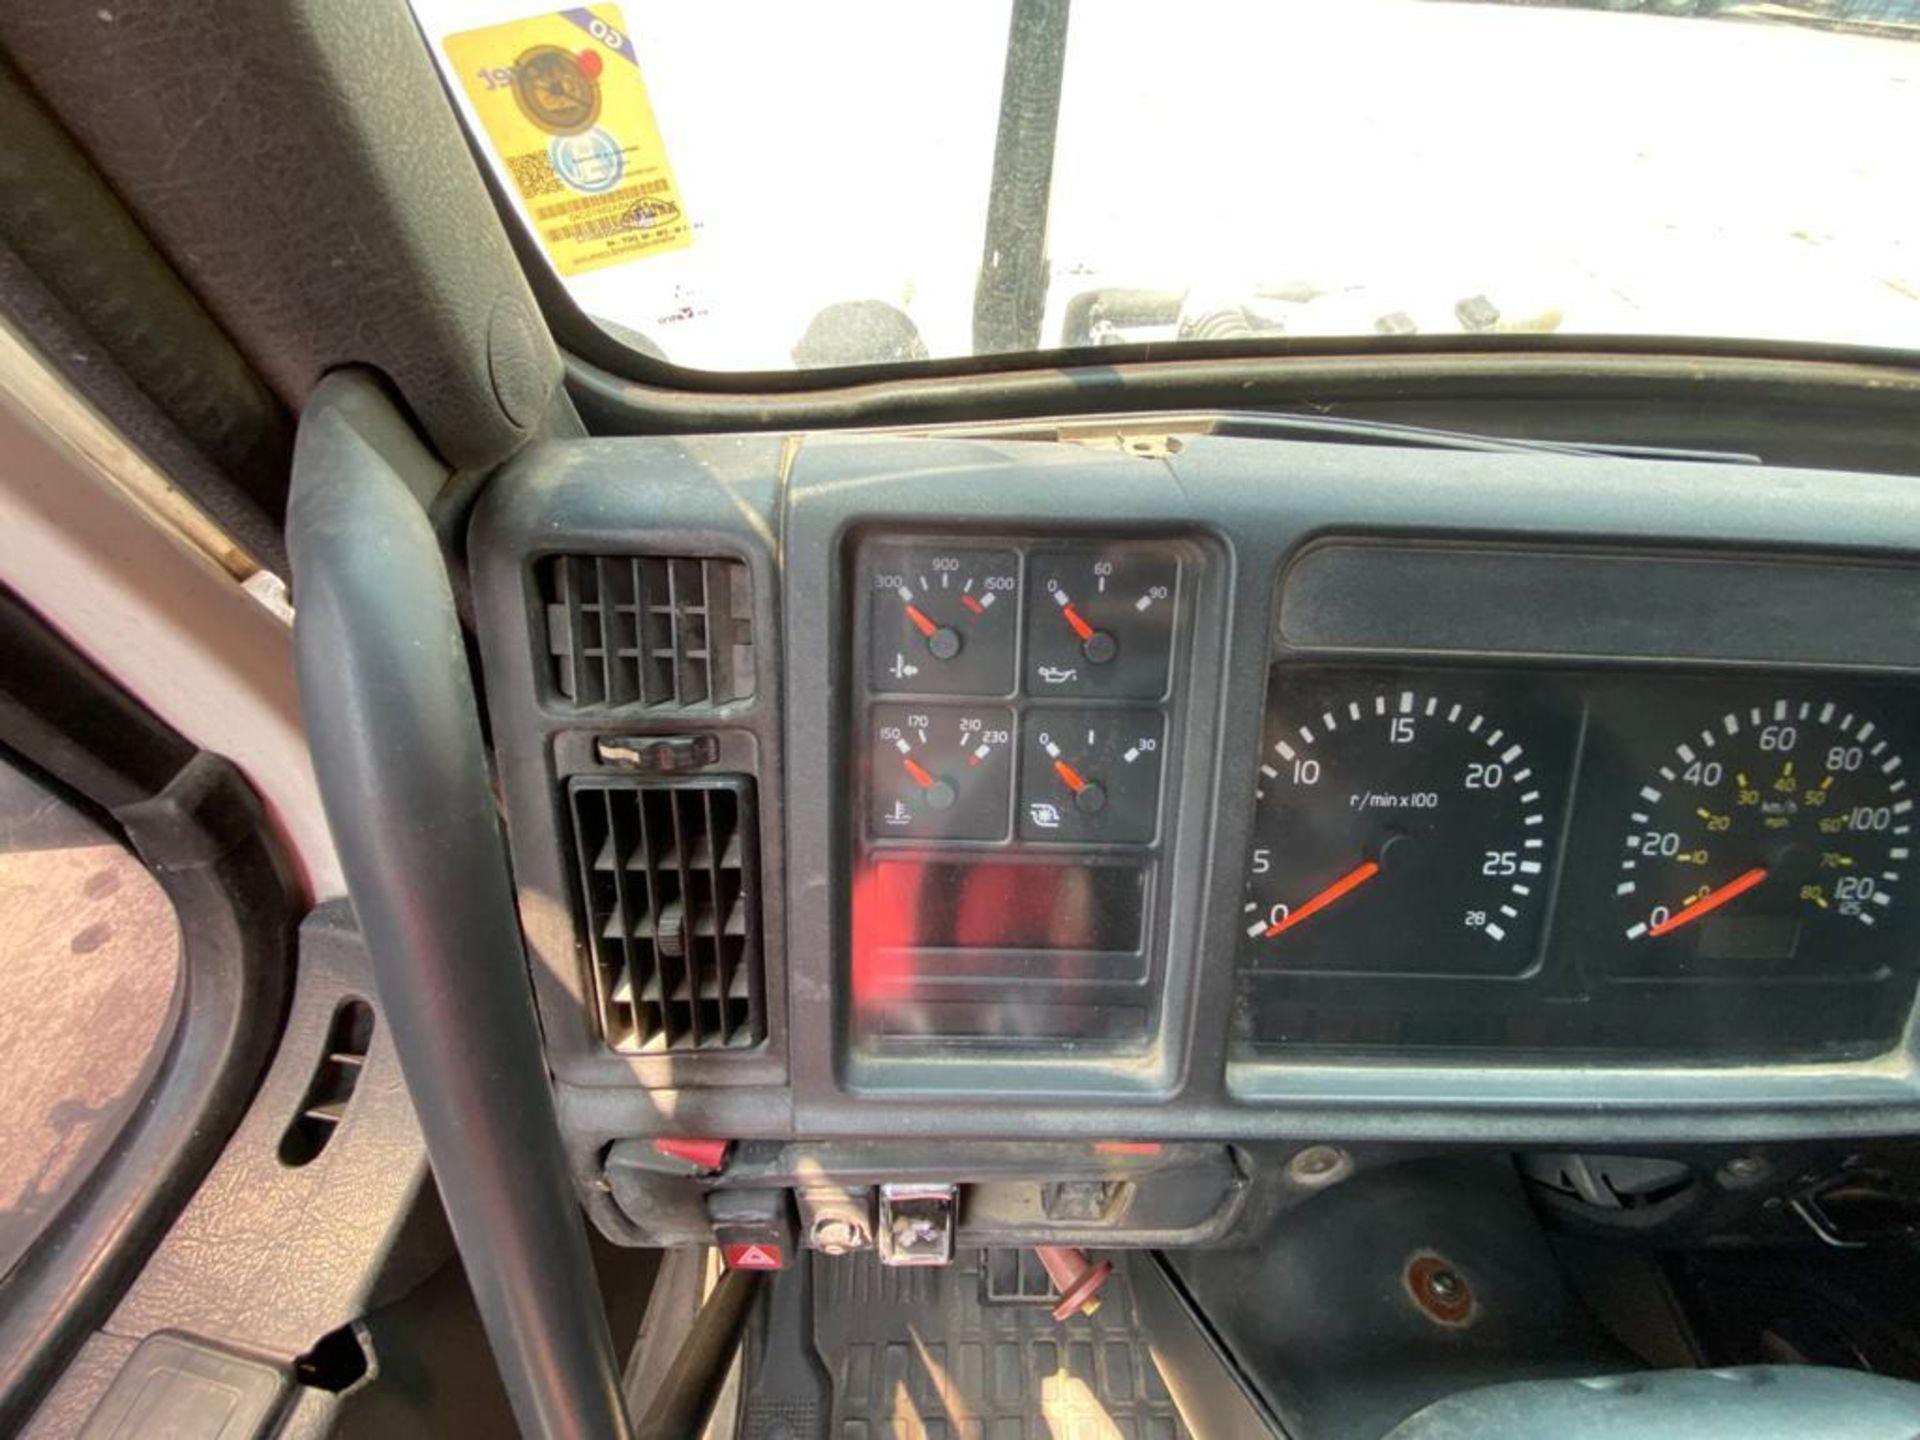 2001 Volvo Sleeper Truck Tractor, estándar transmissión of 18 speeds, with Volvo motor - Image 52 of 60